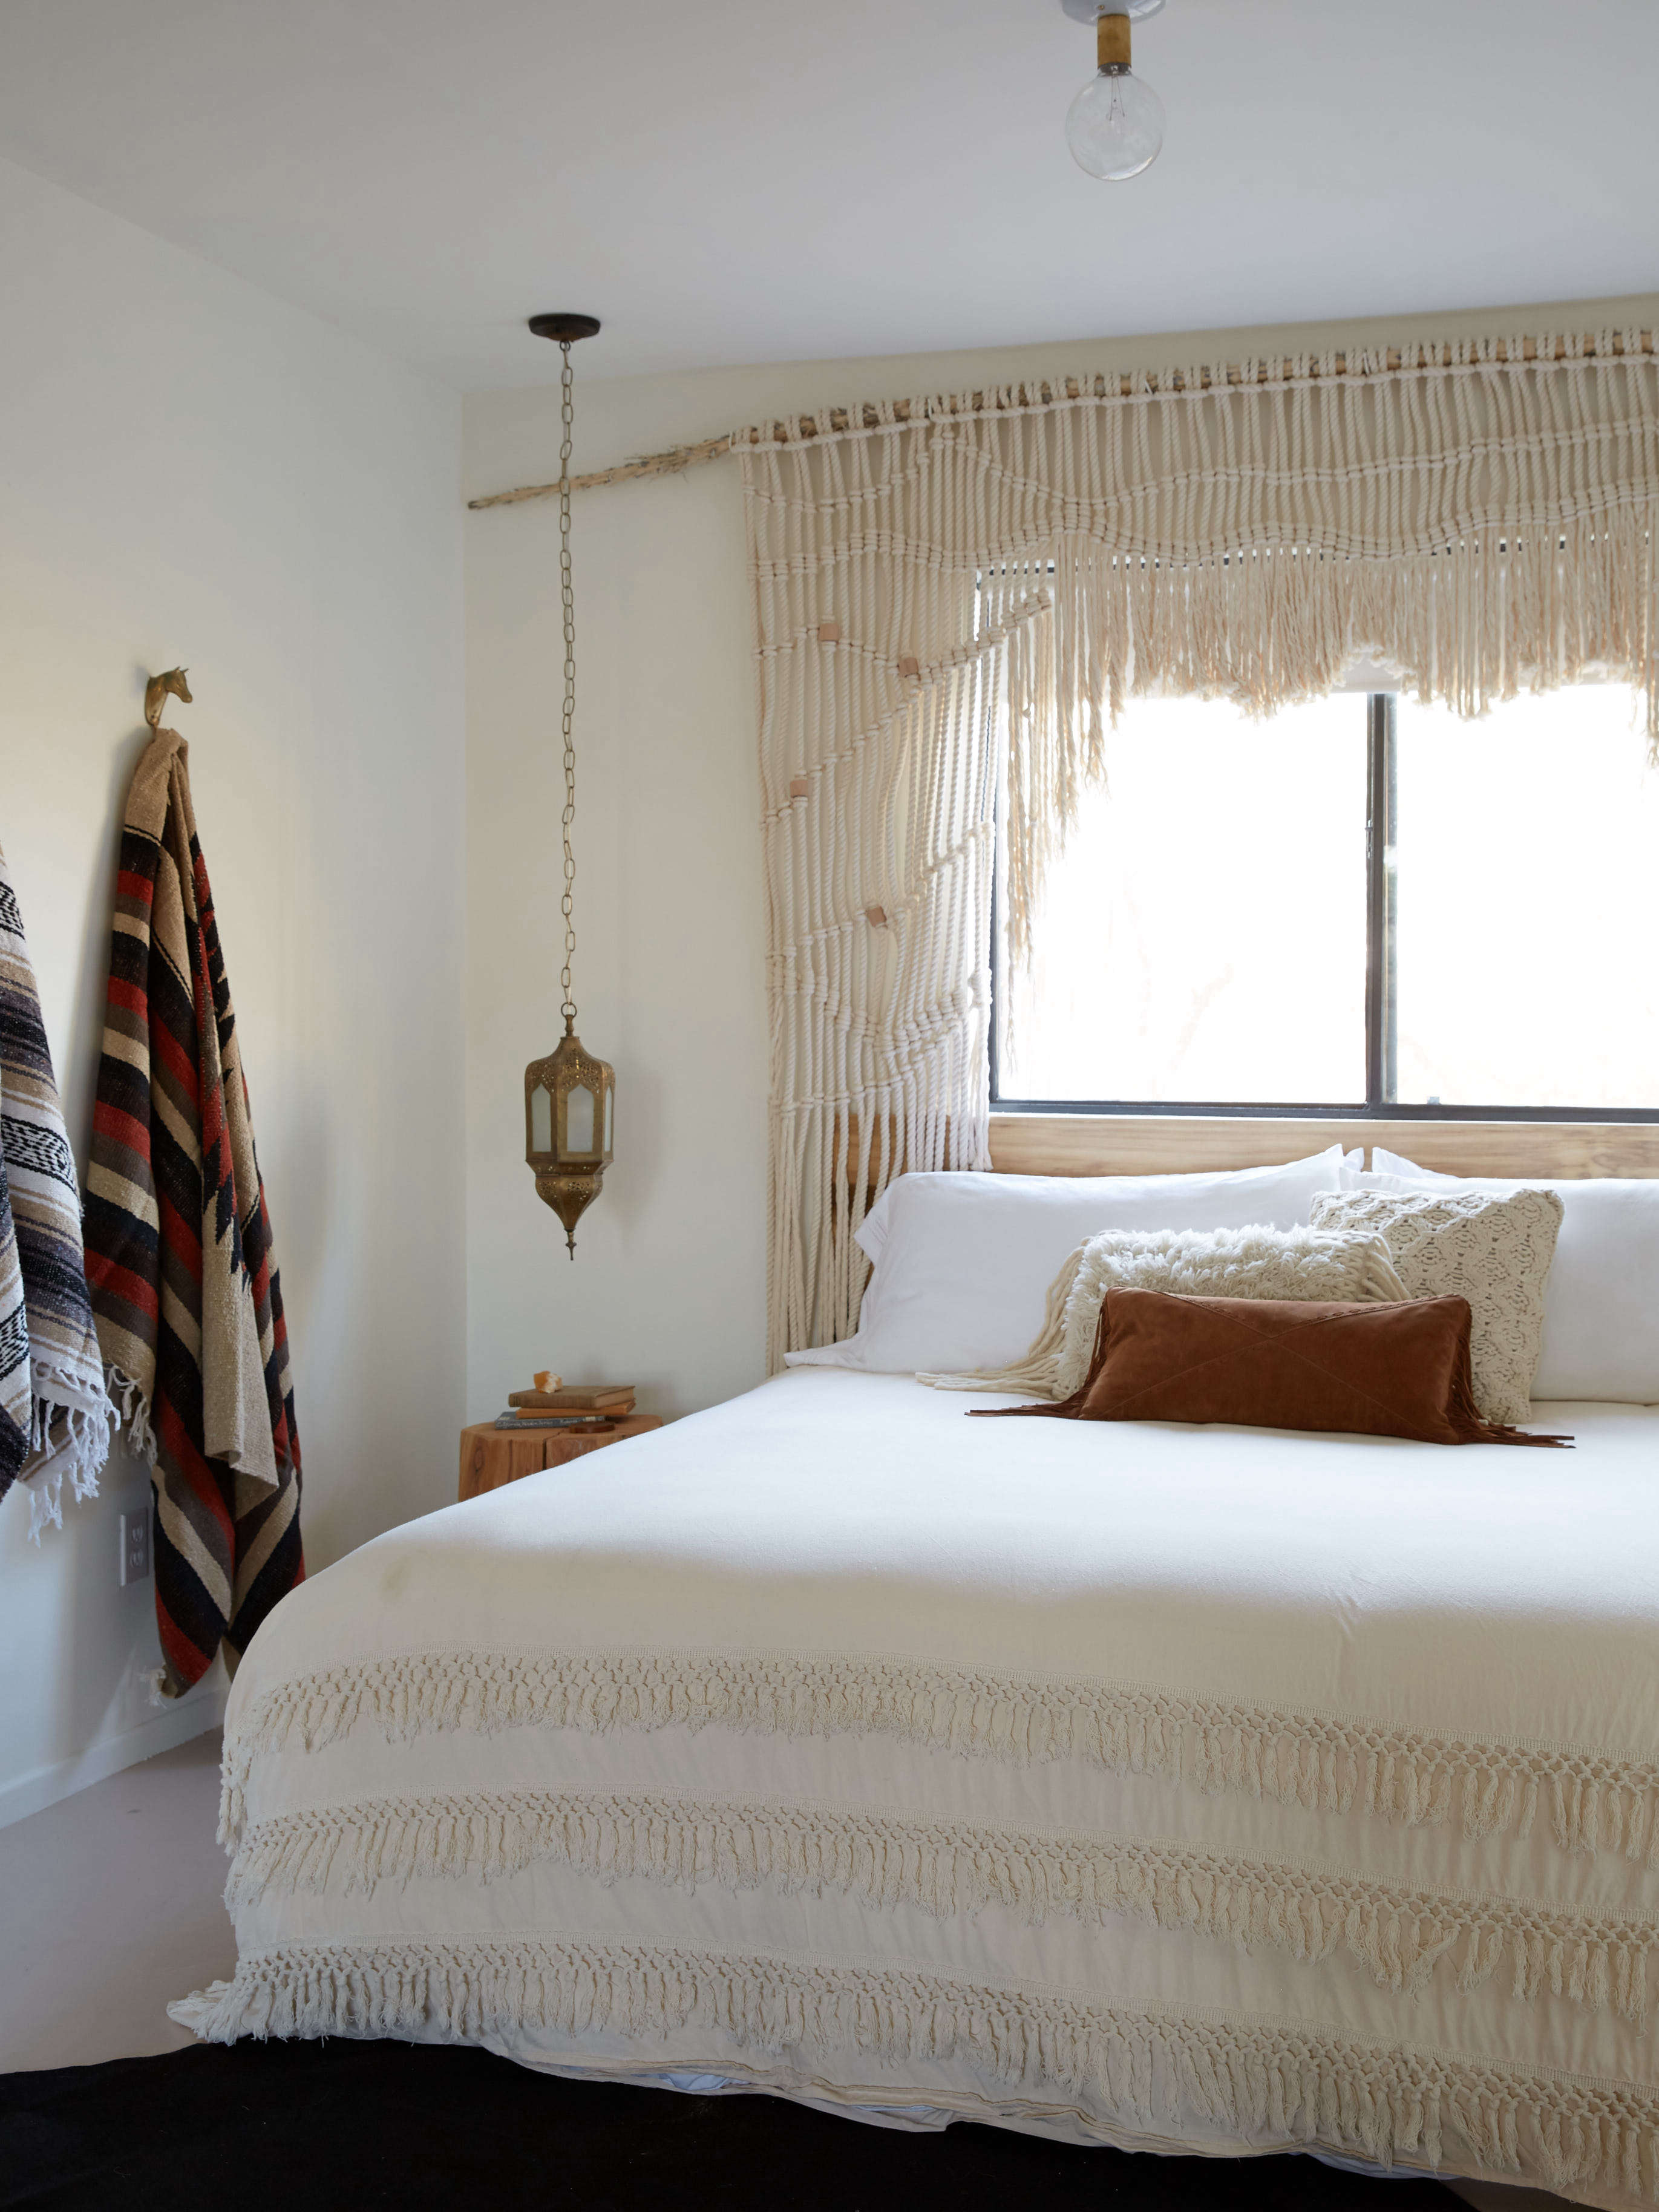 Macrame window curtain/window frame at the Joshua Tree Casita, an Airbnb, Kate Sears photo